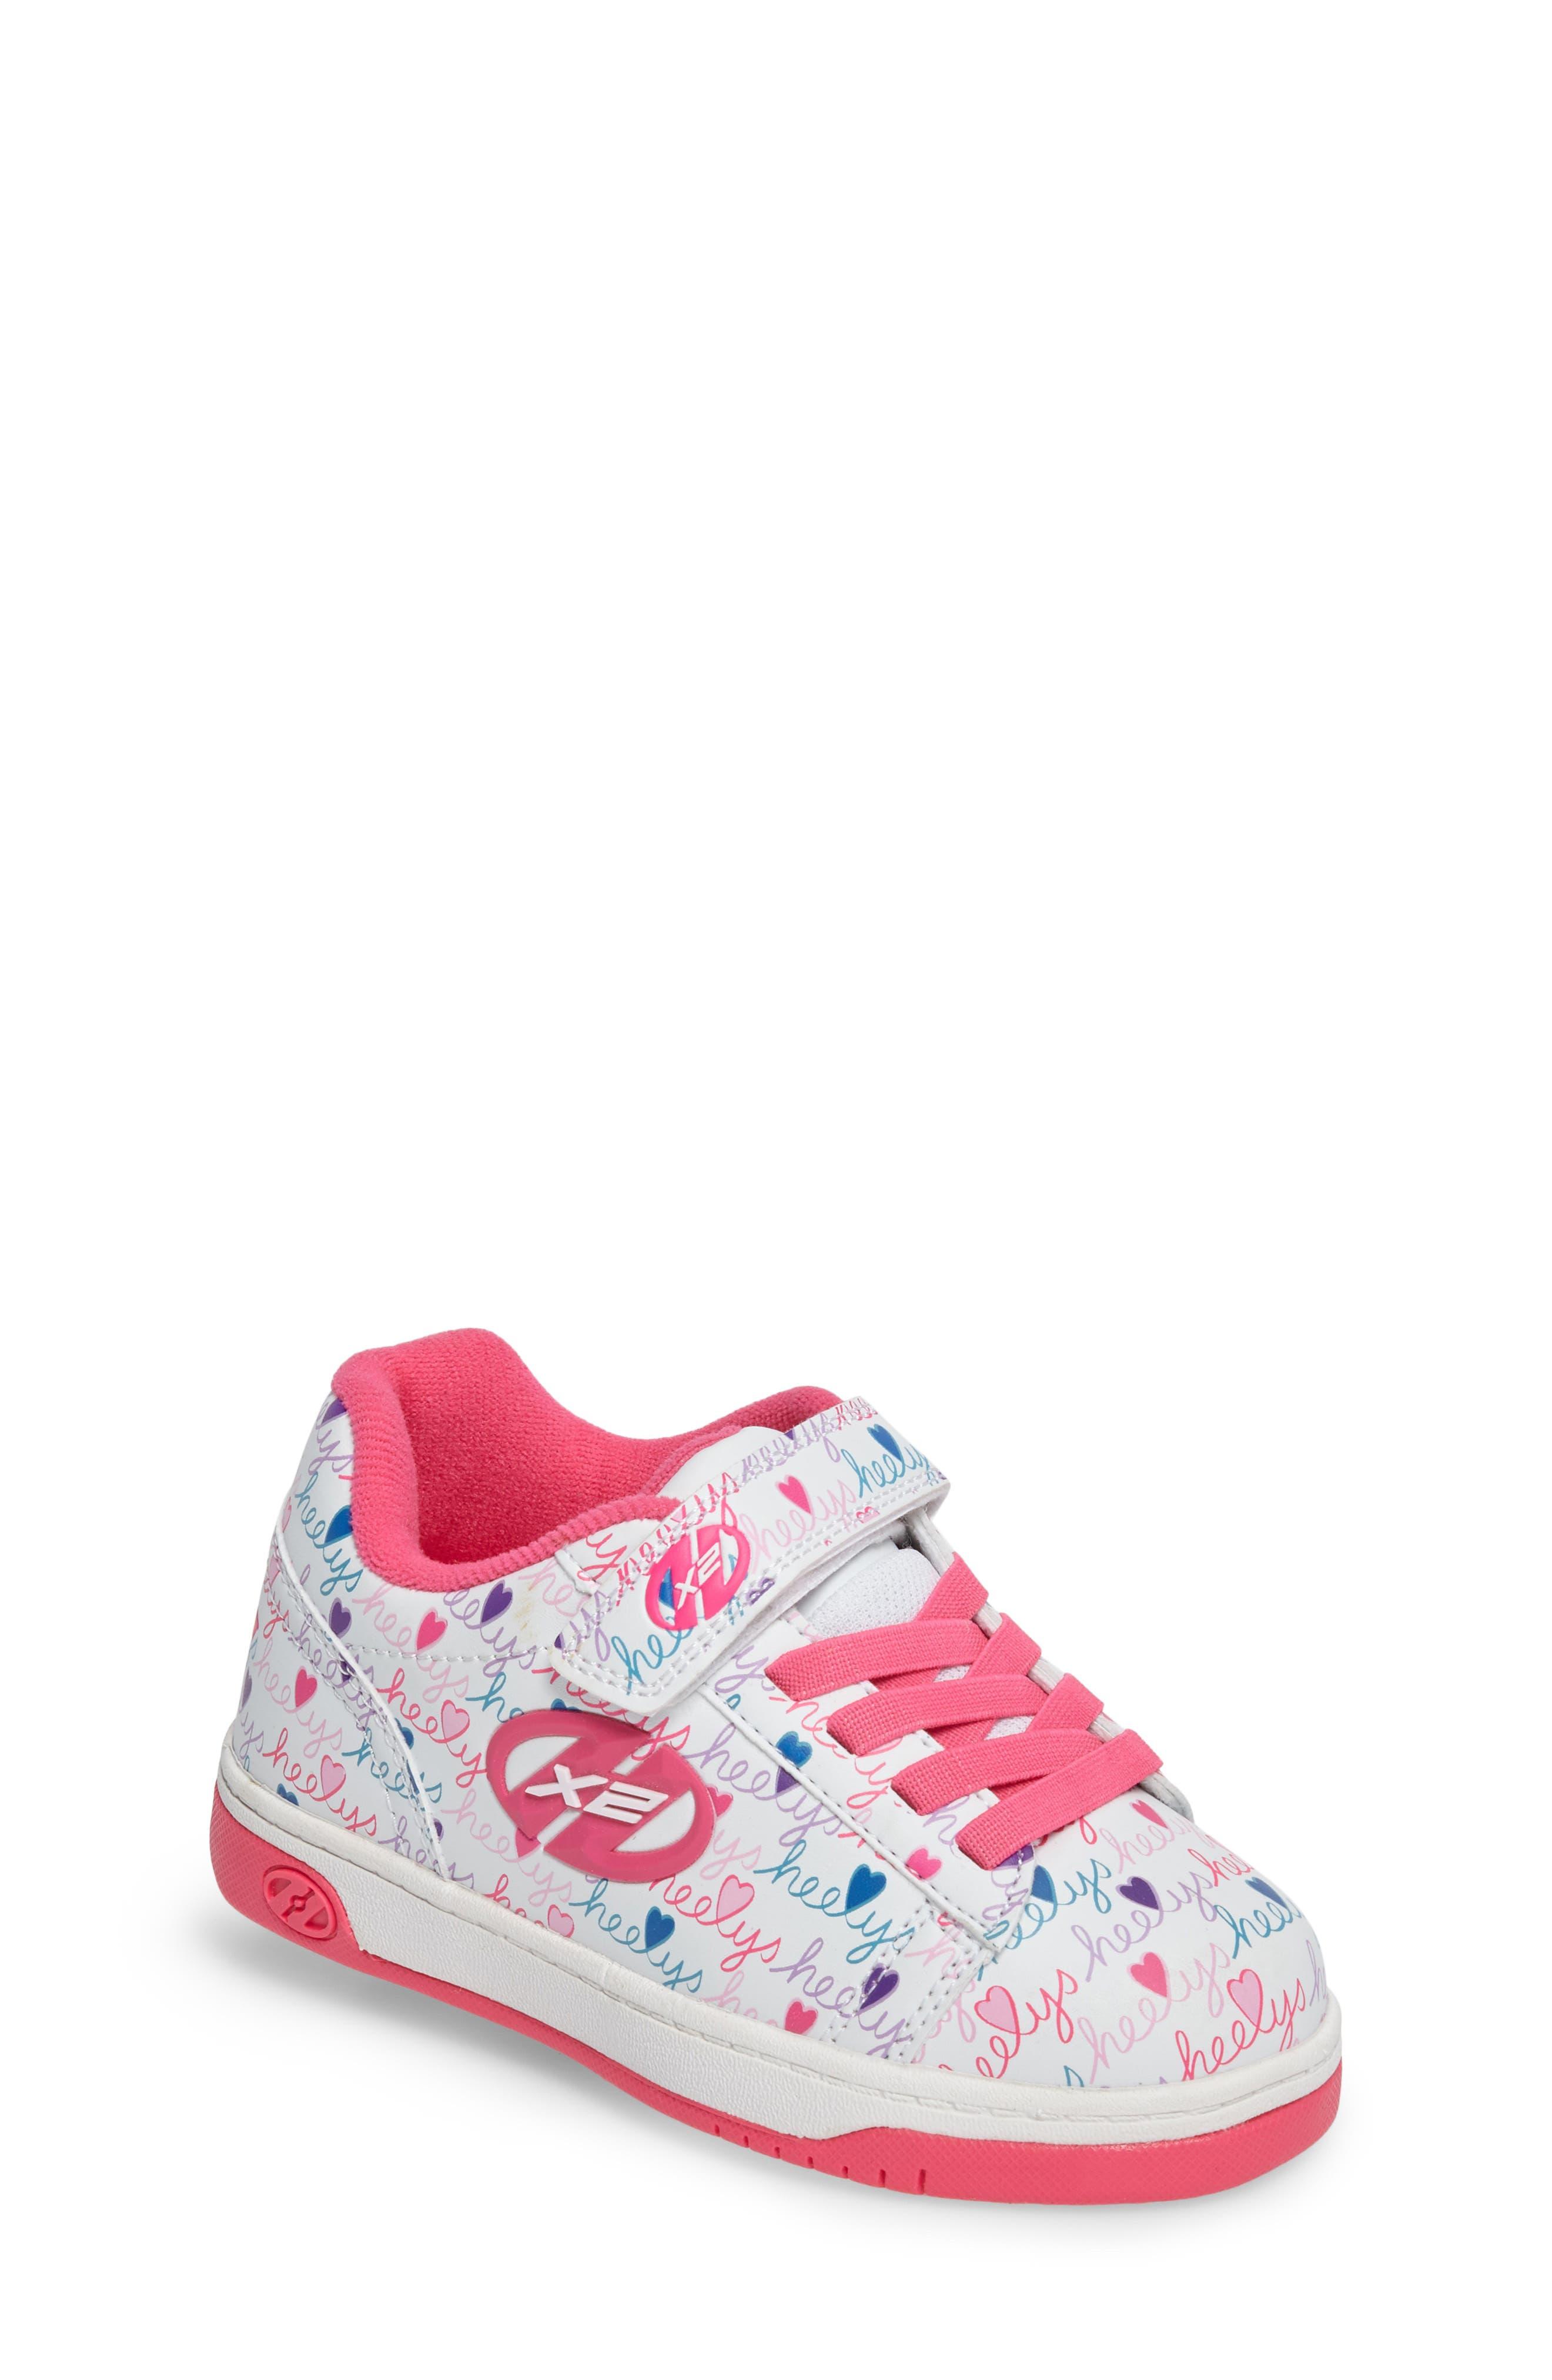 Heelys Dual Up X2 Sneaker (Toddler, Little Kid & Big Kid)